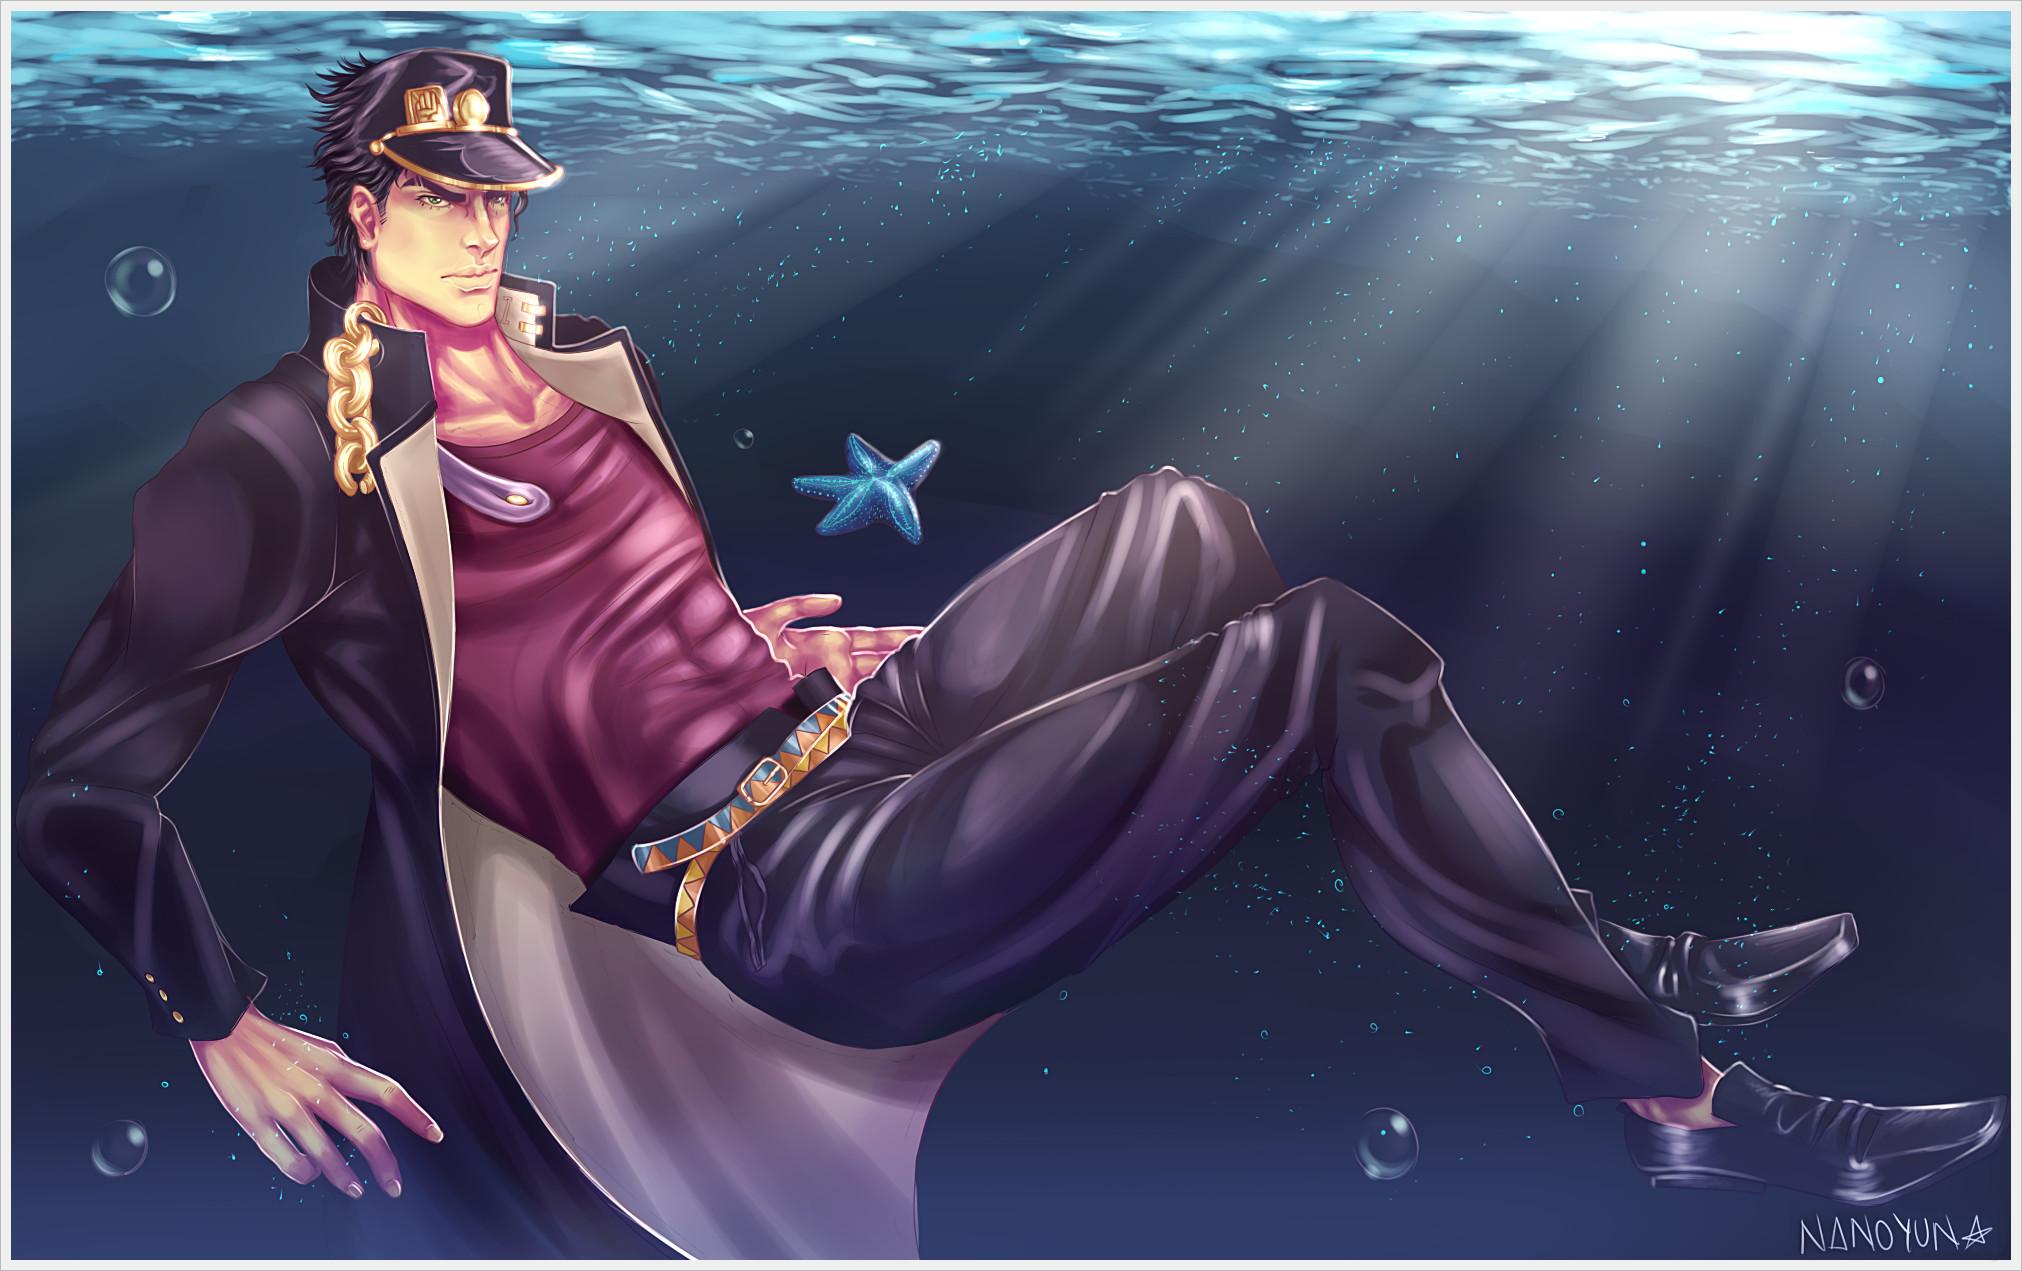 … Jotaro Kujo – In the Sea by lNAN0